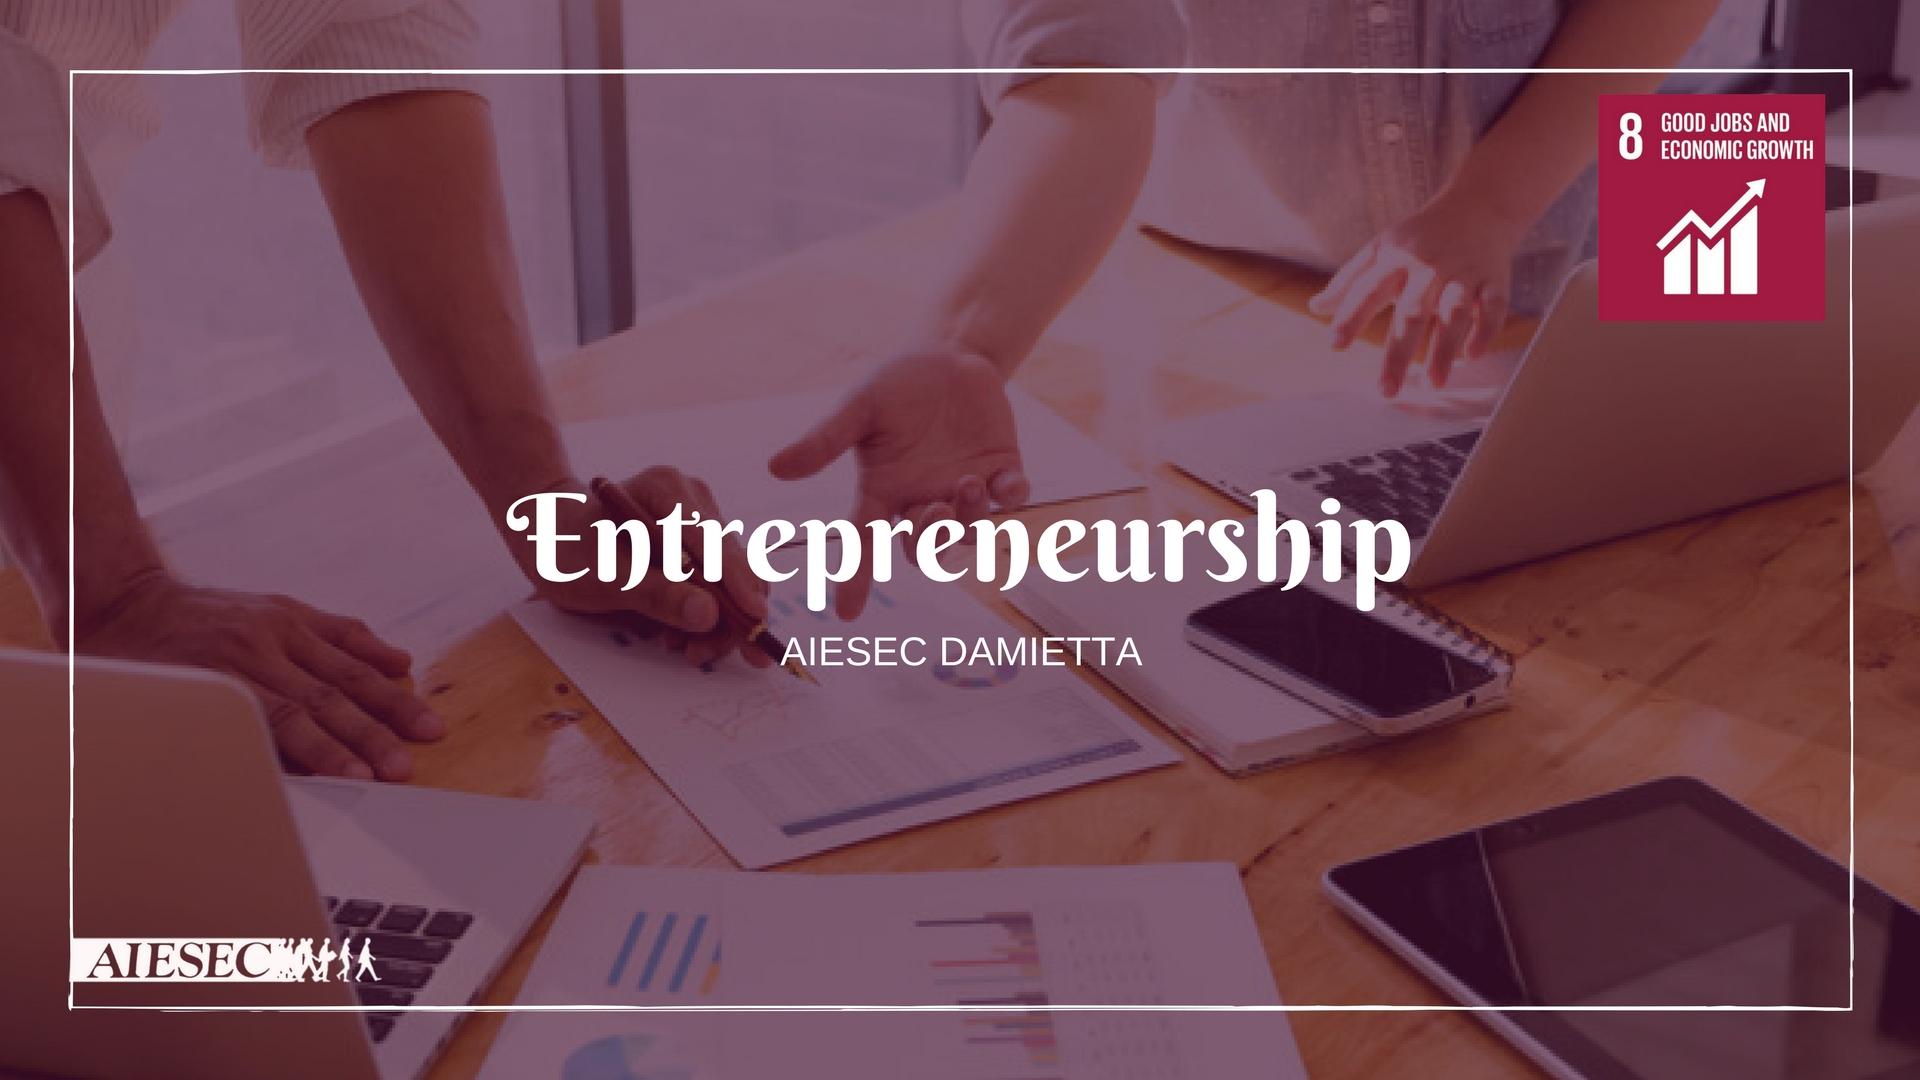 Entrepreneurship- Egypt -Decent work and economic growth